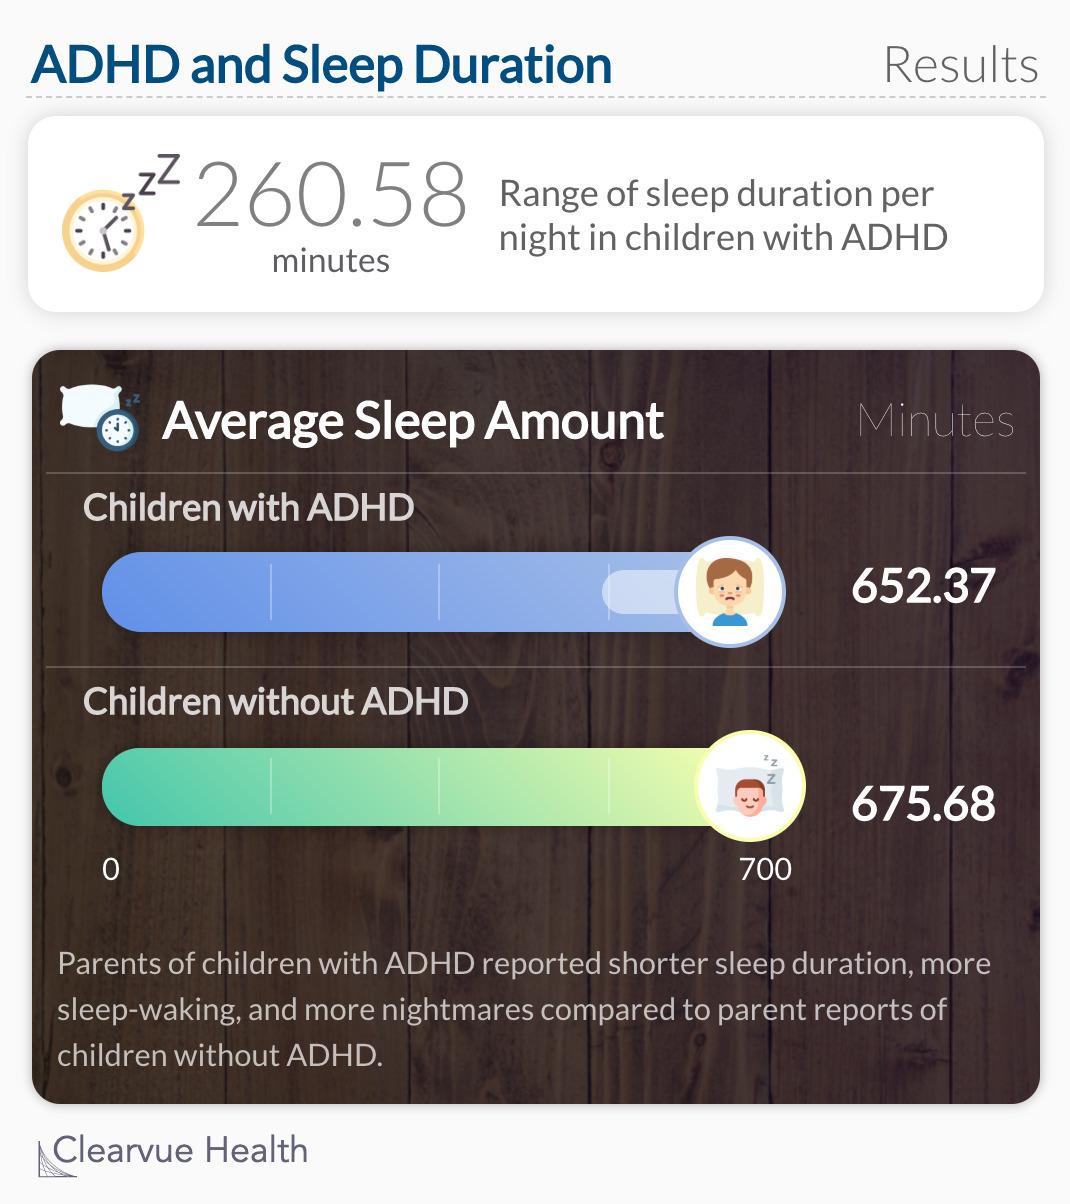 ADHD and Sleep Duration